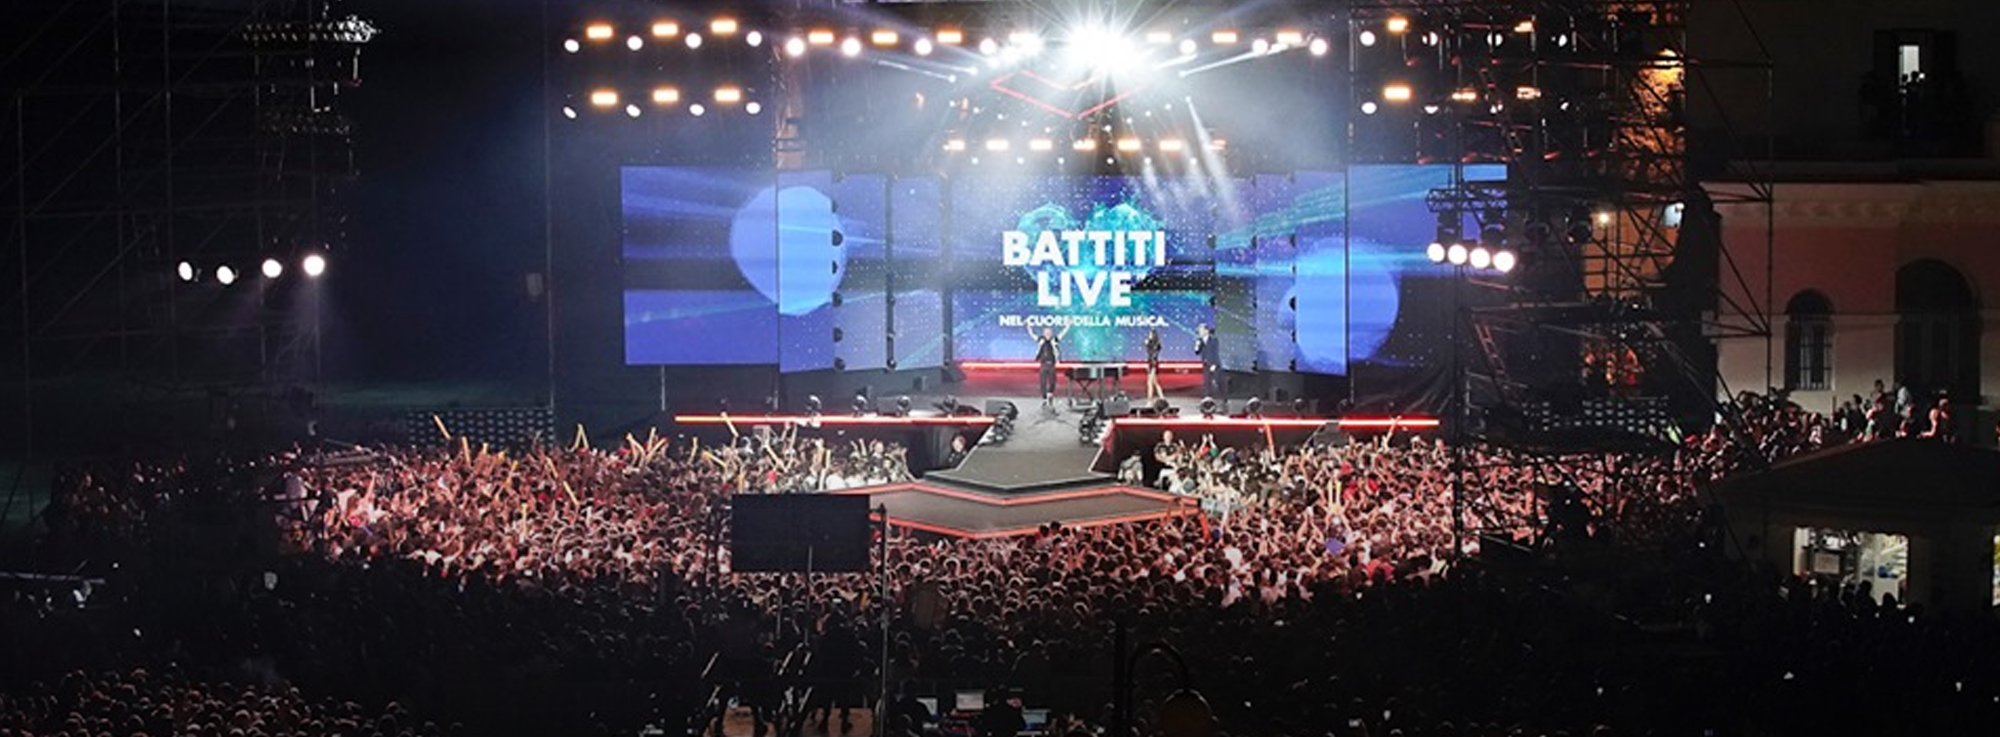 Trani: Radionorba Battiti Live